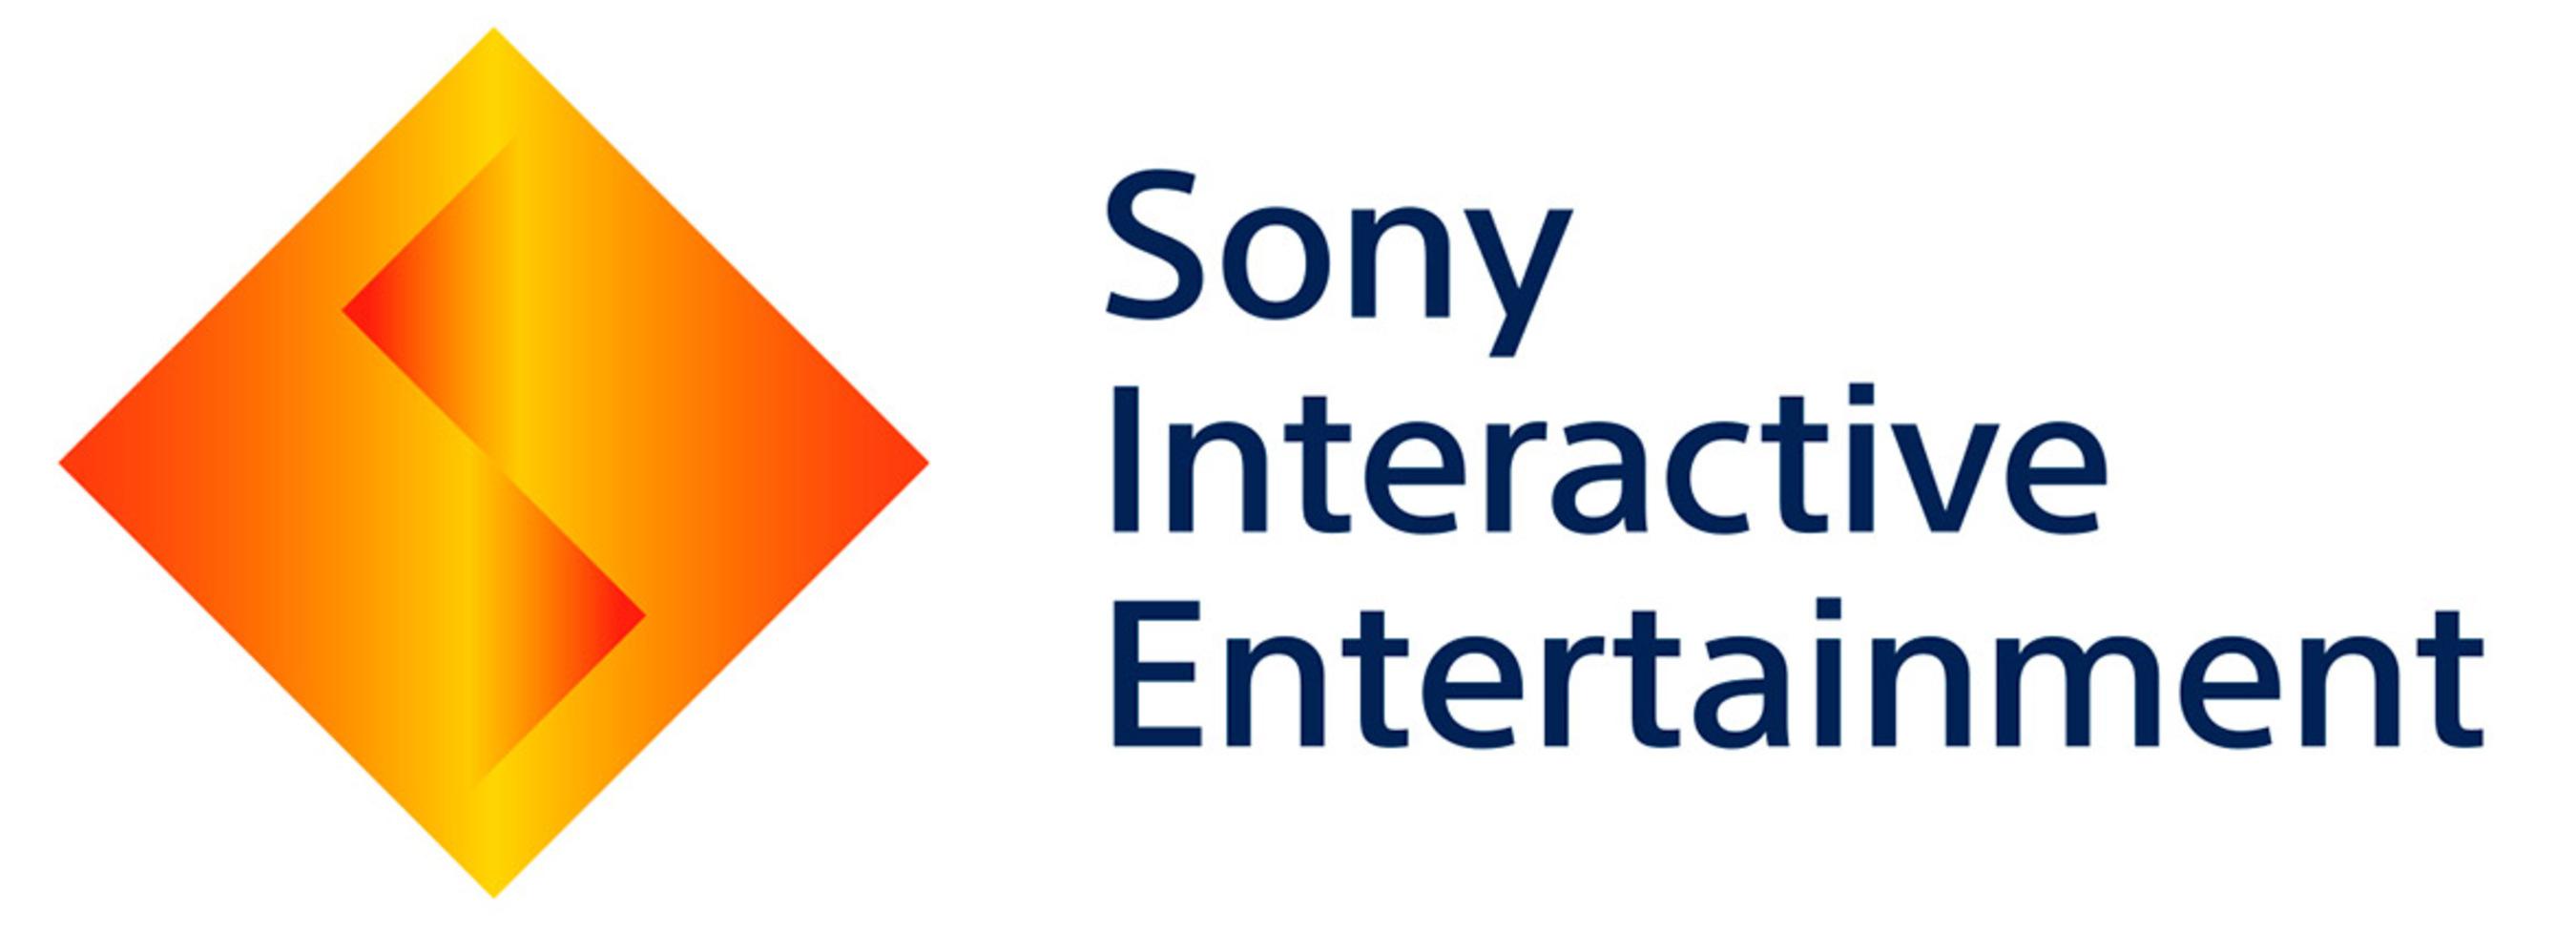 Sony Computer Entertainment corporate logo.